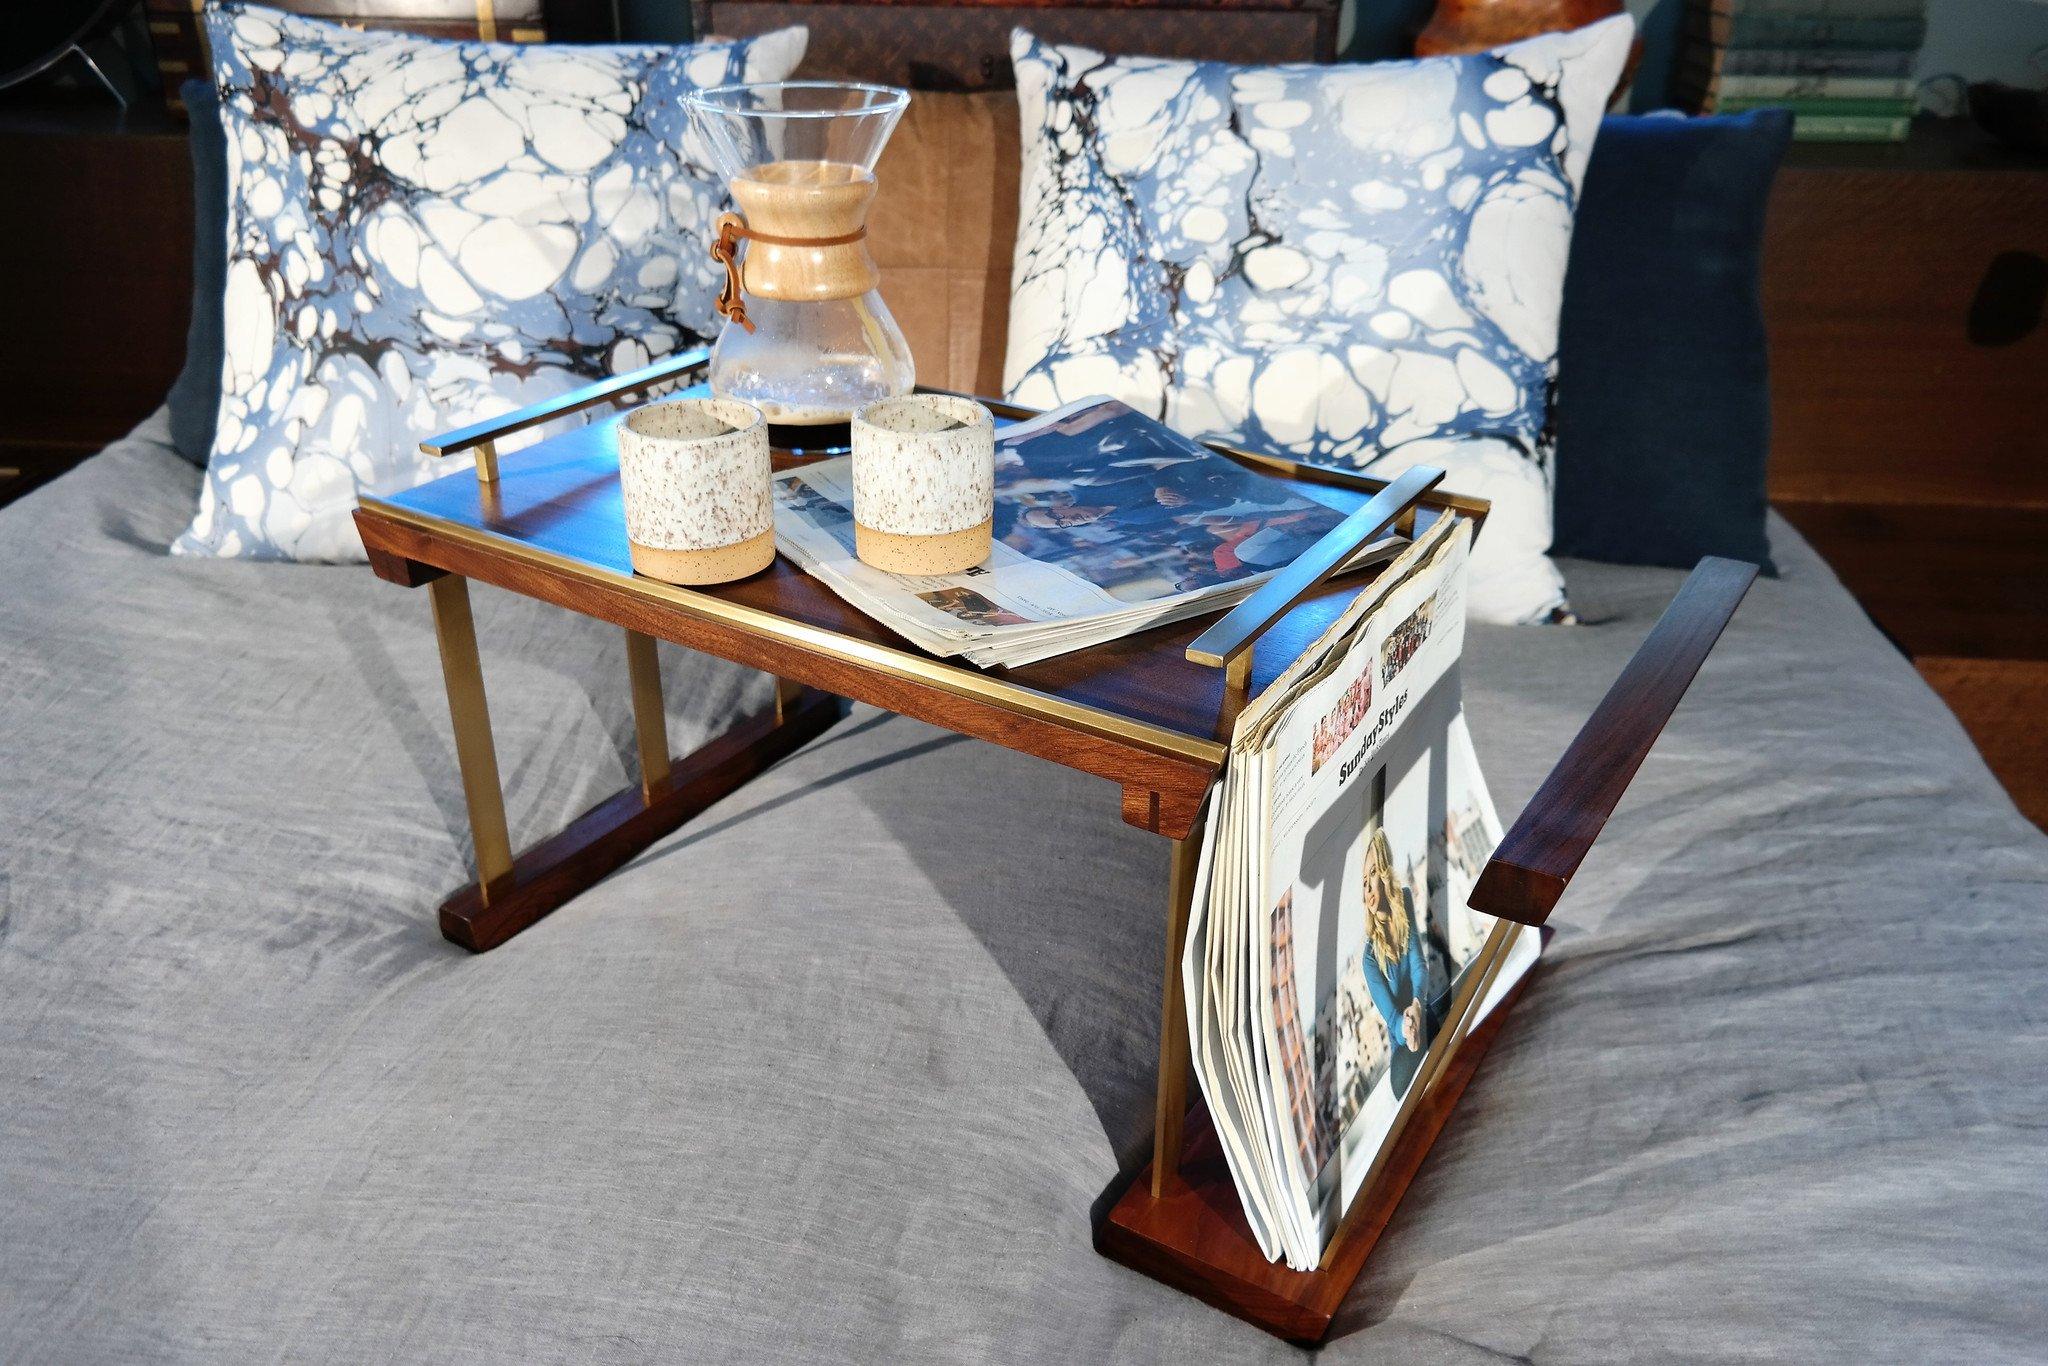 Столик для завтрака с подставкой для журналов